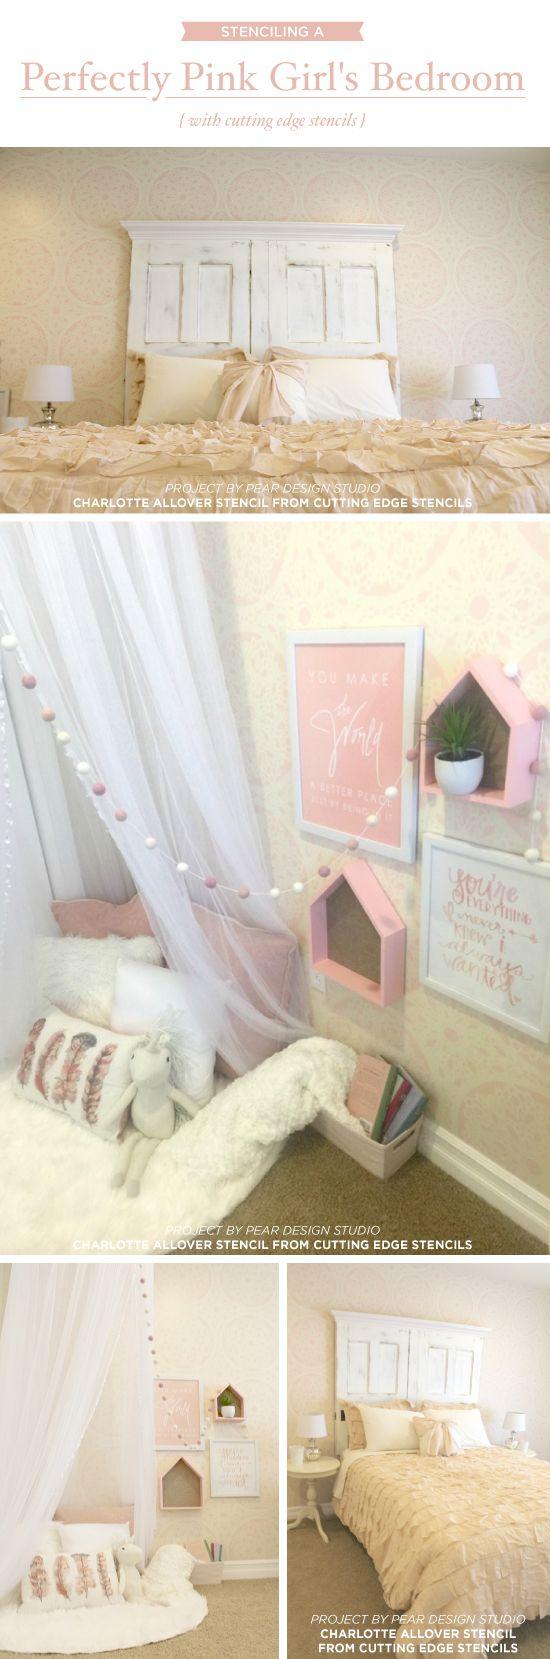 Kinderzimmer decke design stenciling a perfectly pink girlus bedroom  interiör  pinterest